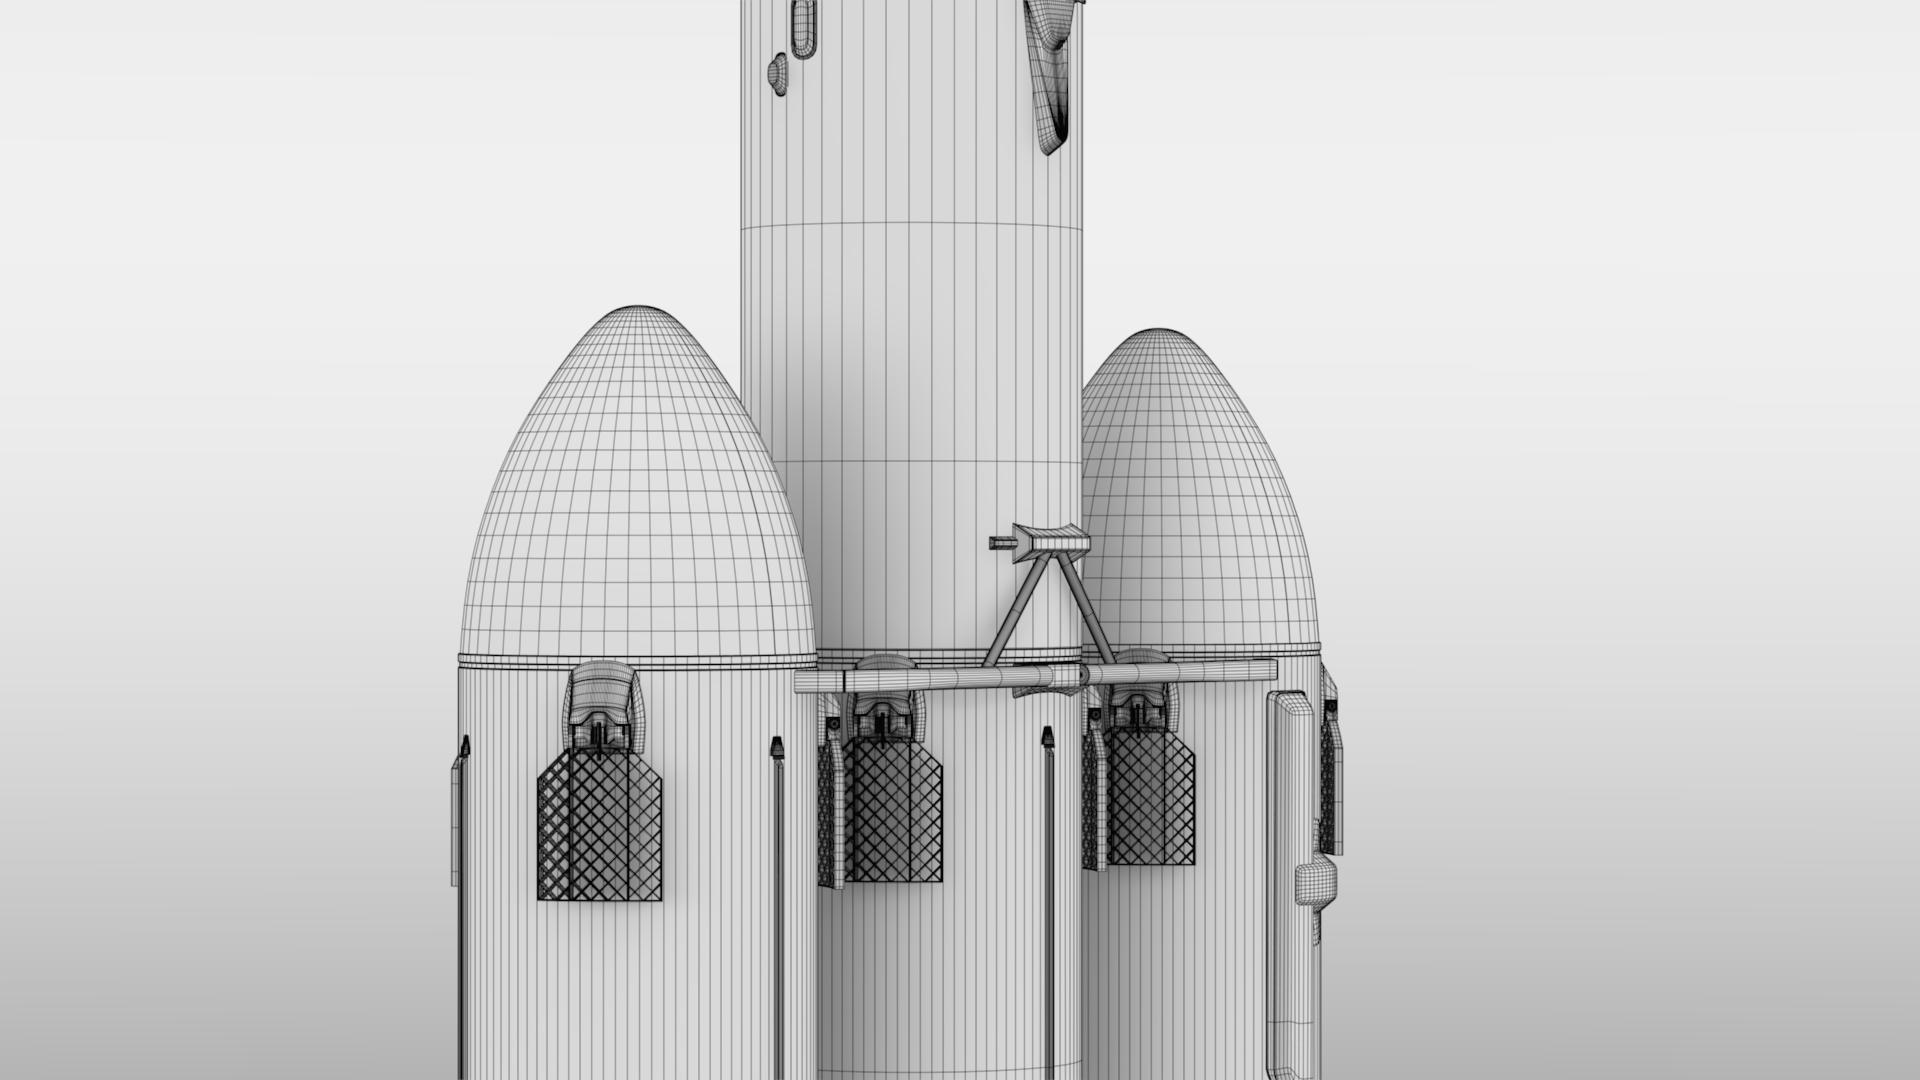 falcon heavy v1.2 3d model max fbx c4d lwo ma mb hrc xsi obj 277828